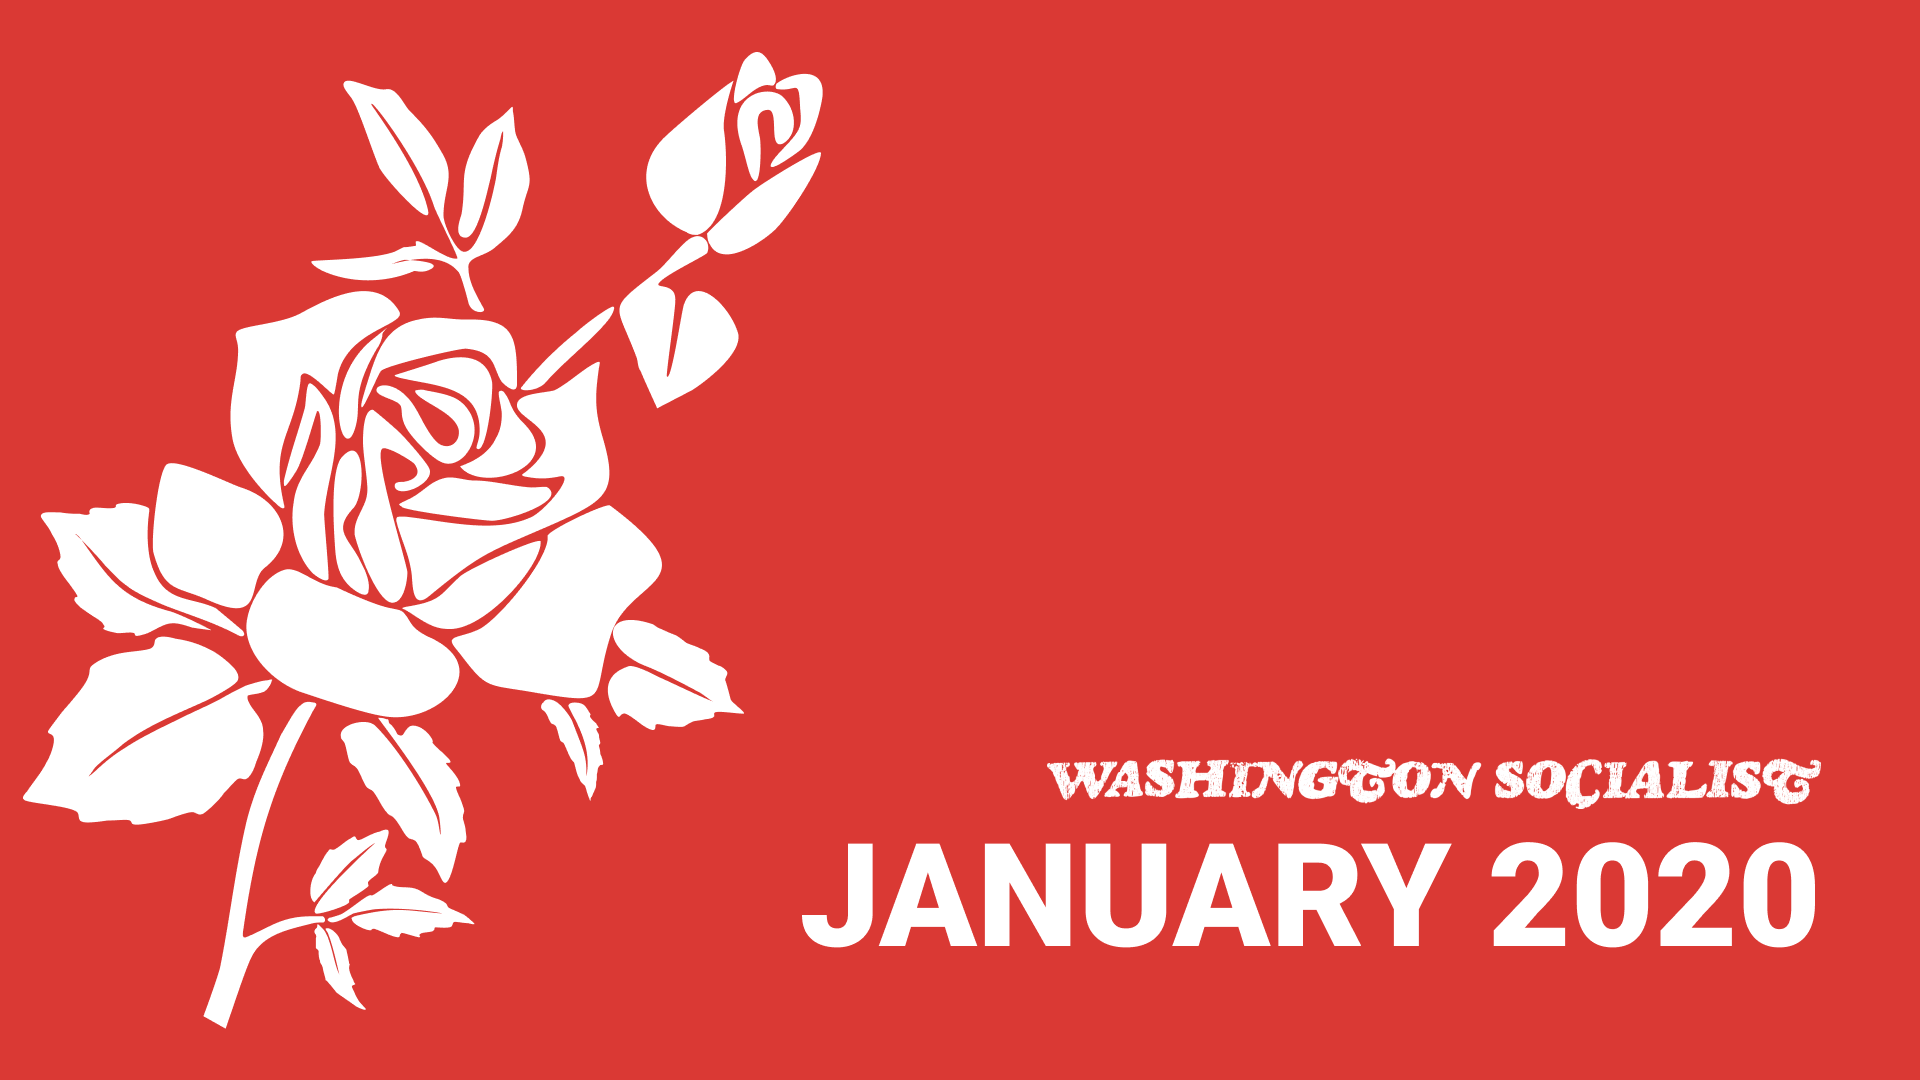 January 2020 Washington Socialist Cover